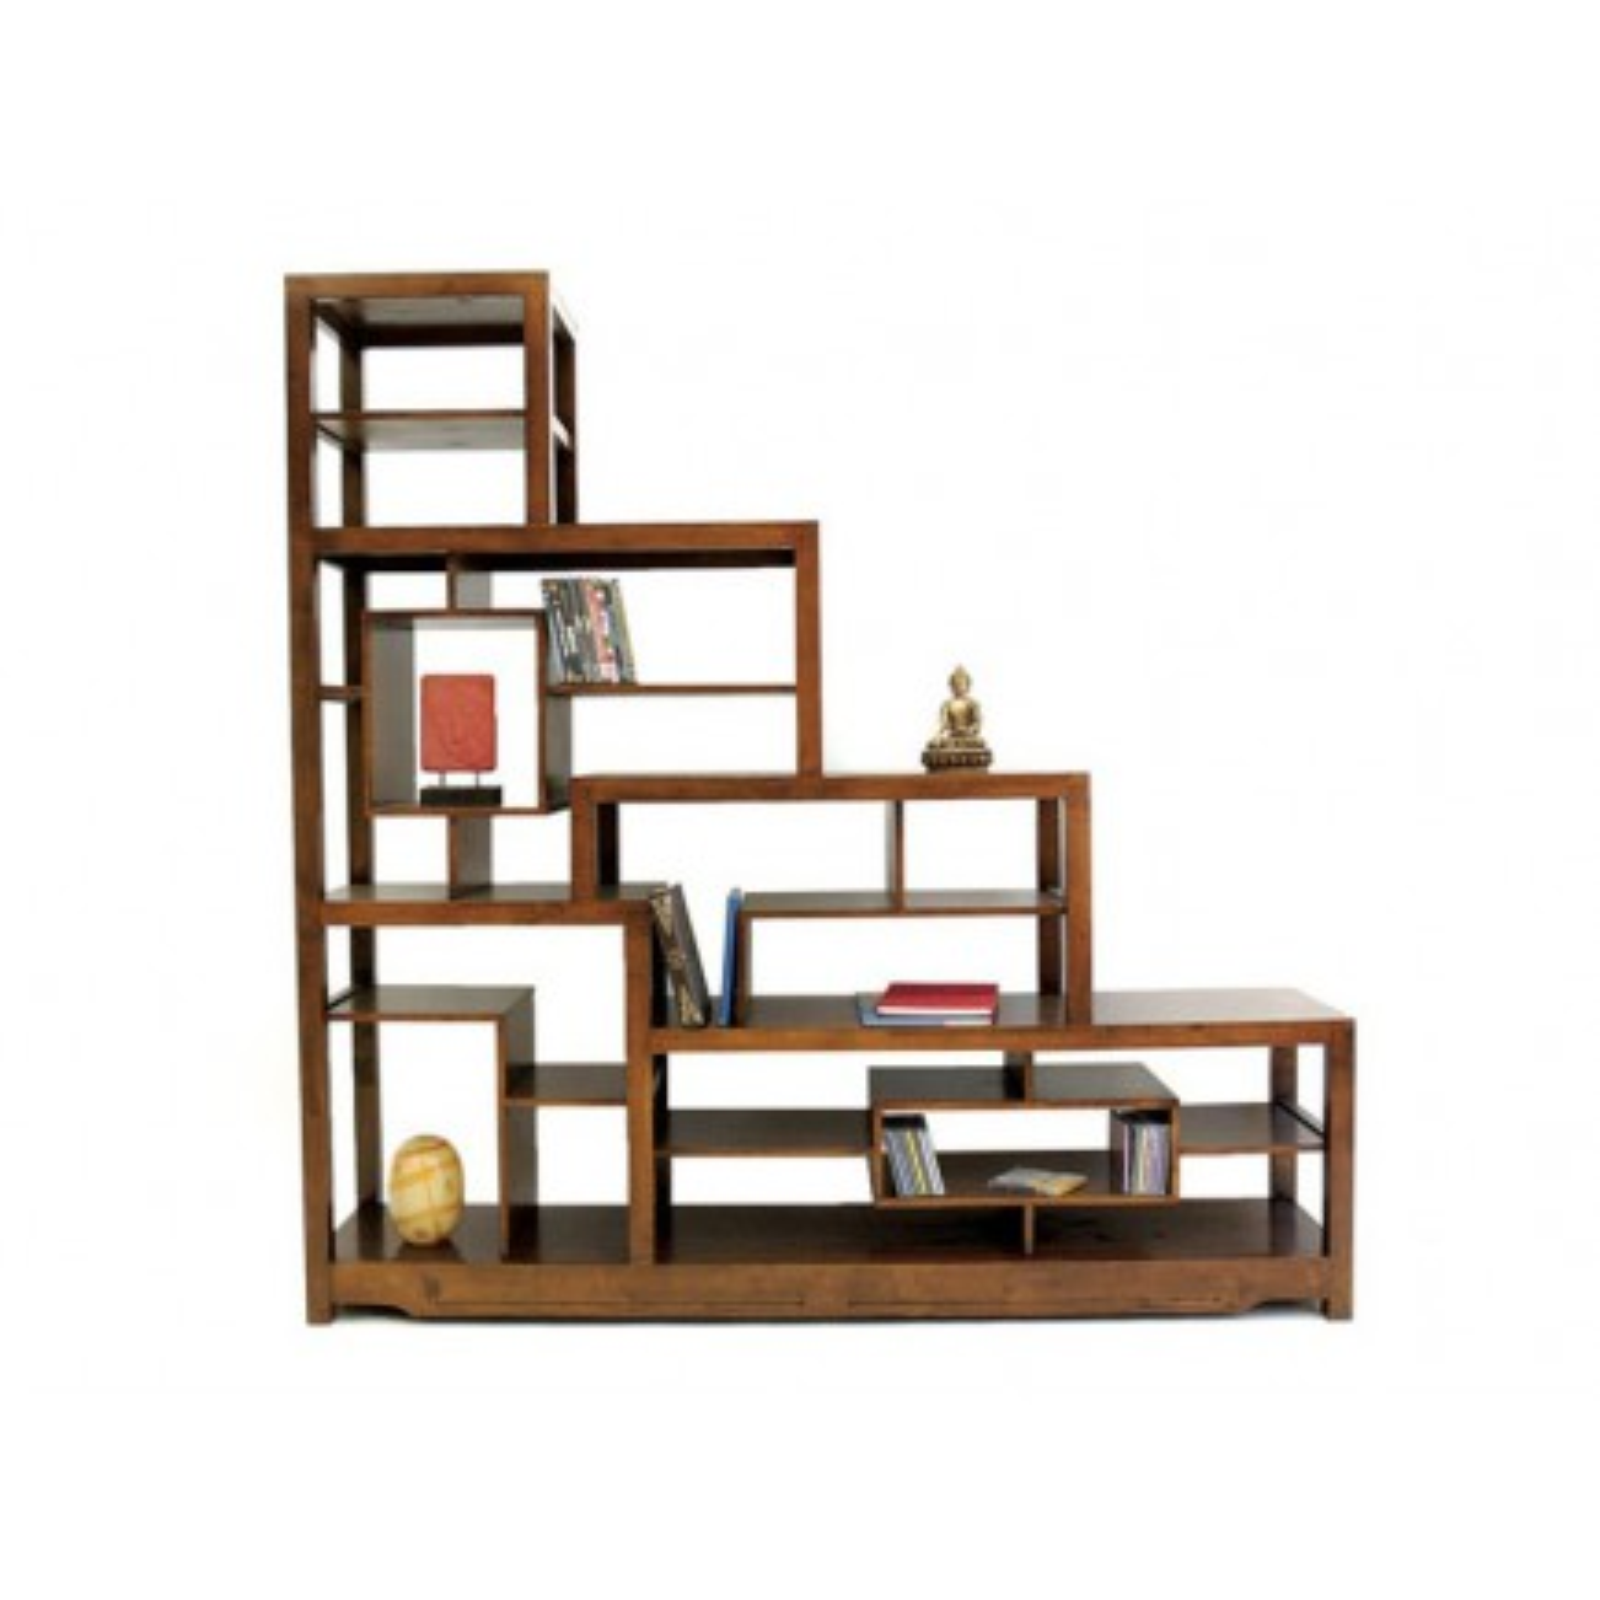 Escalier Déstructuré Omega Hévéa - meuble style design